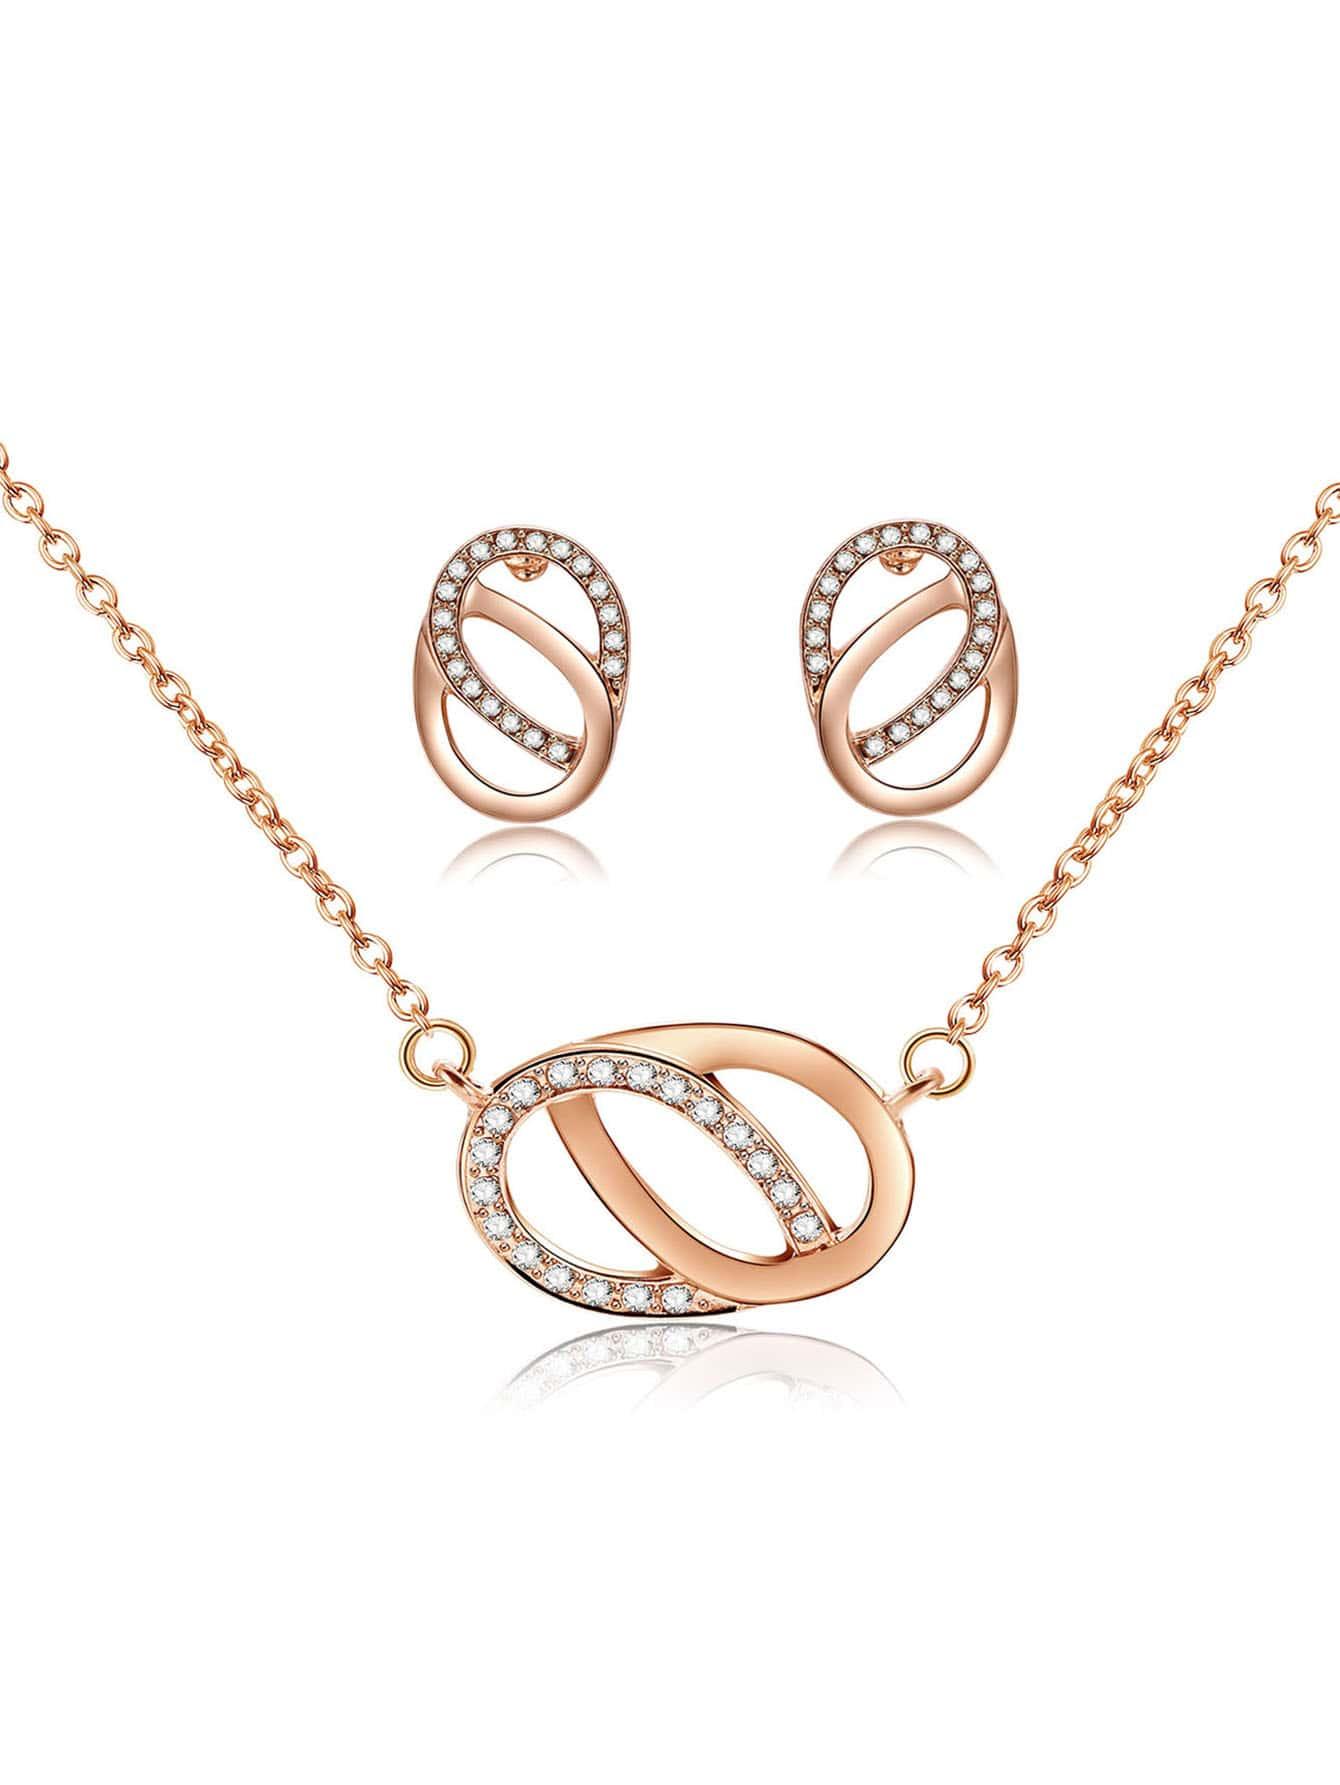 Link Kreis Anhänger Halskette & Ohrringe